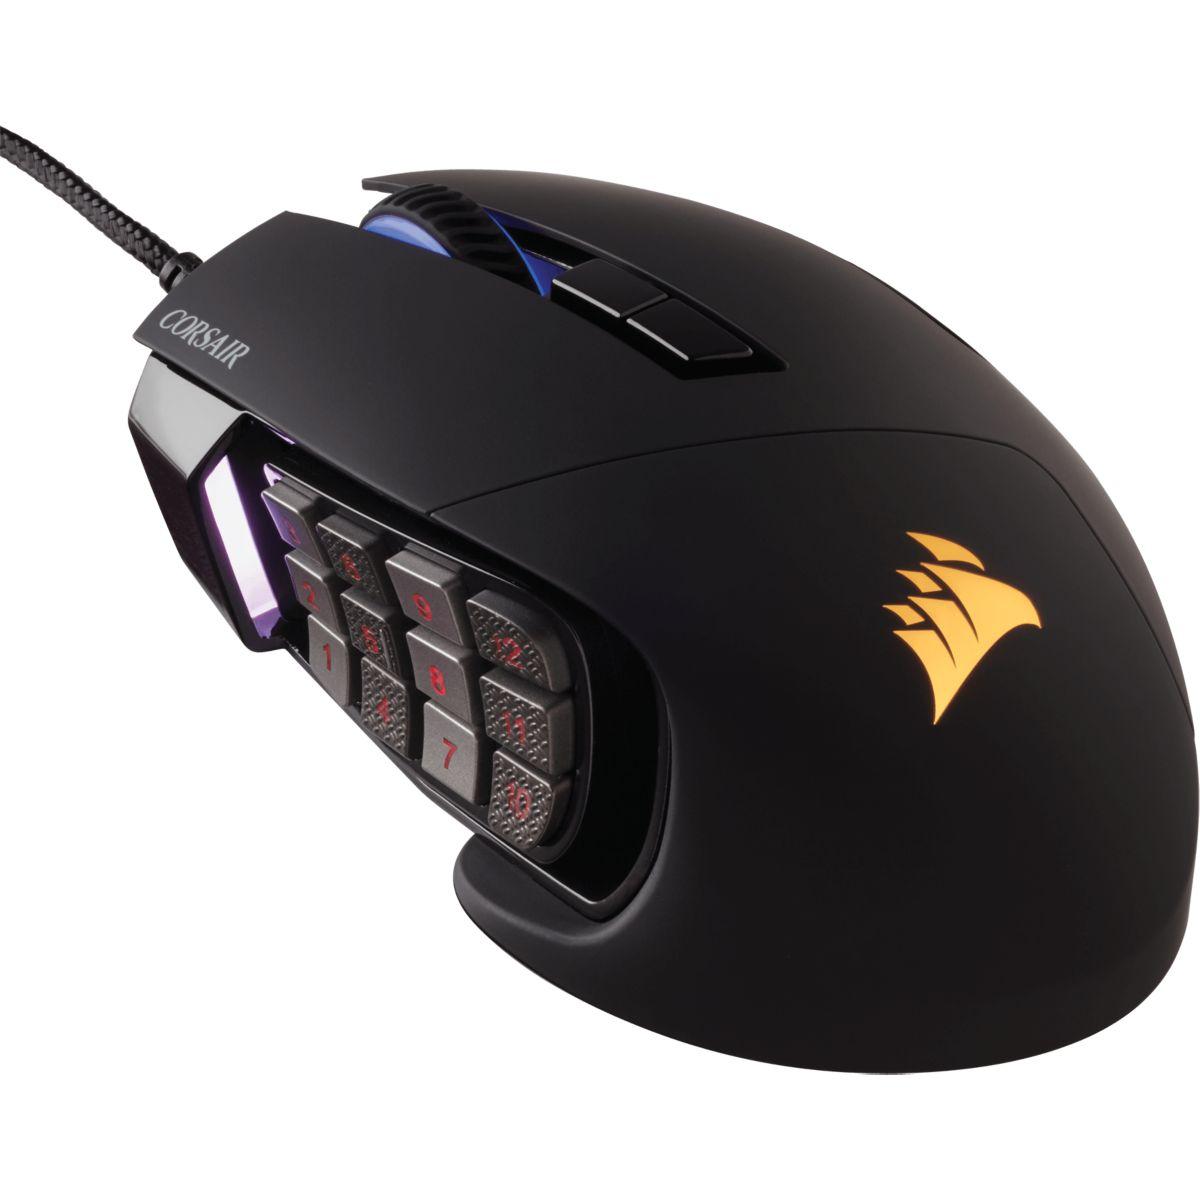 Souris gamer CORSAIR Scimitar Pro RGB - Noir